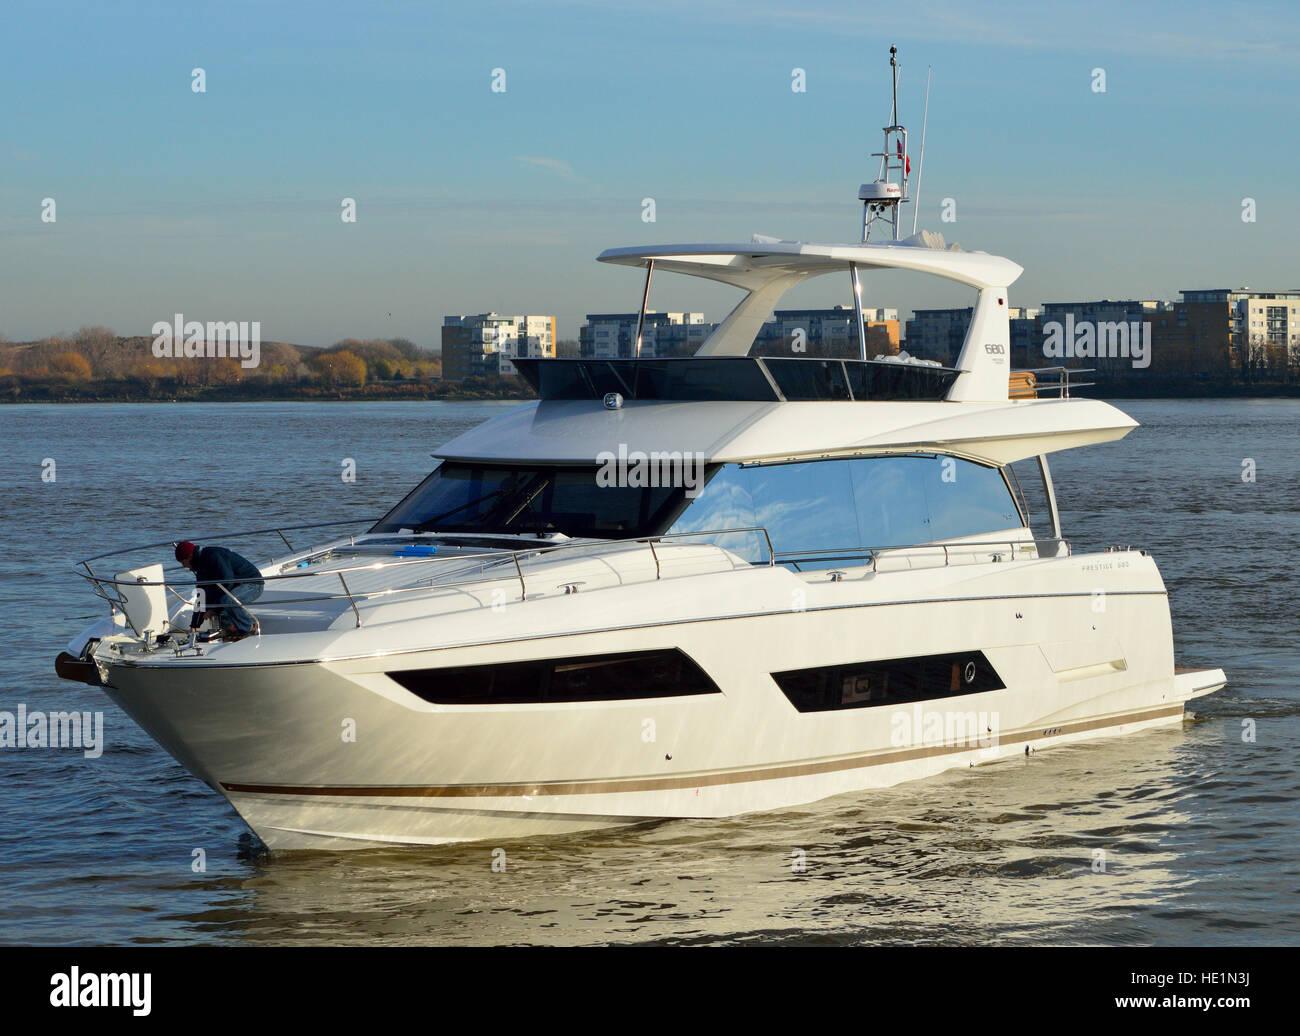 Prestige 680 Luxury yacht heading to London Boat Show 2017 - Stock Image